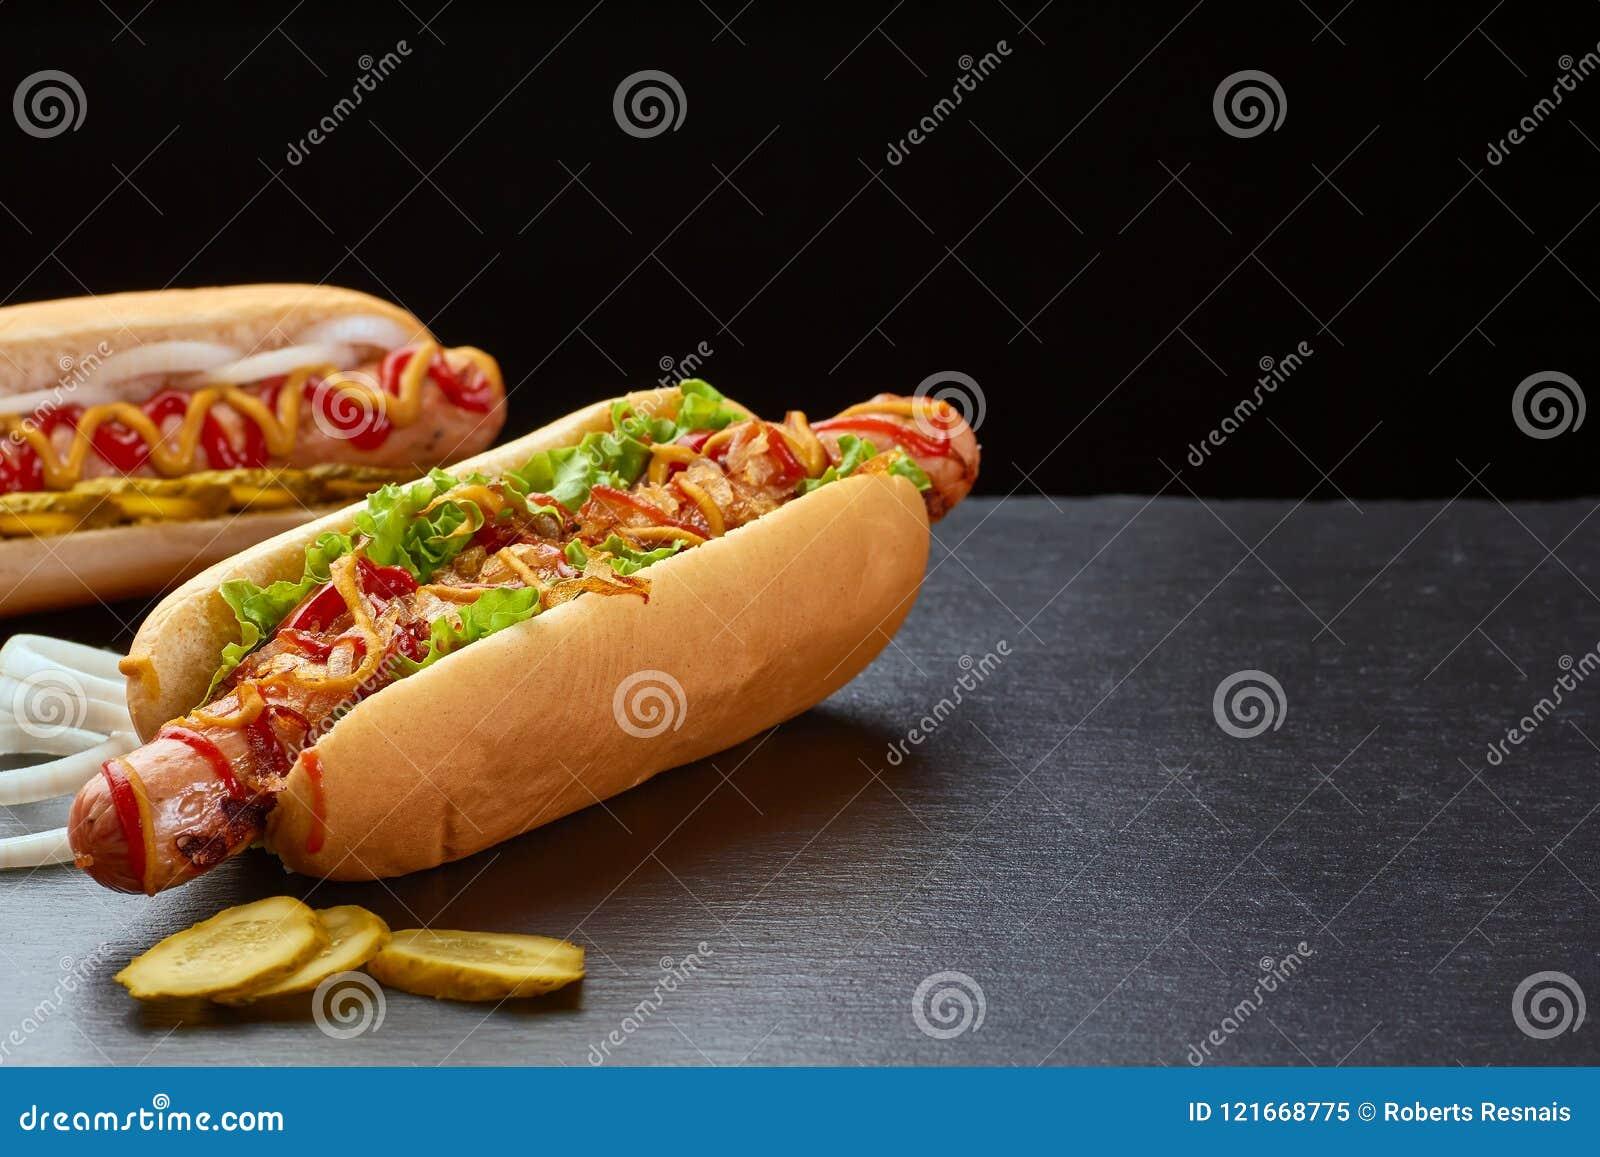 Twee sappige hotdogs op donkere leiachtergrond